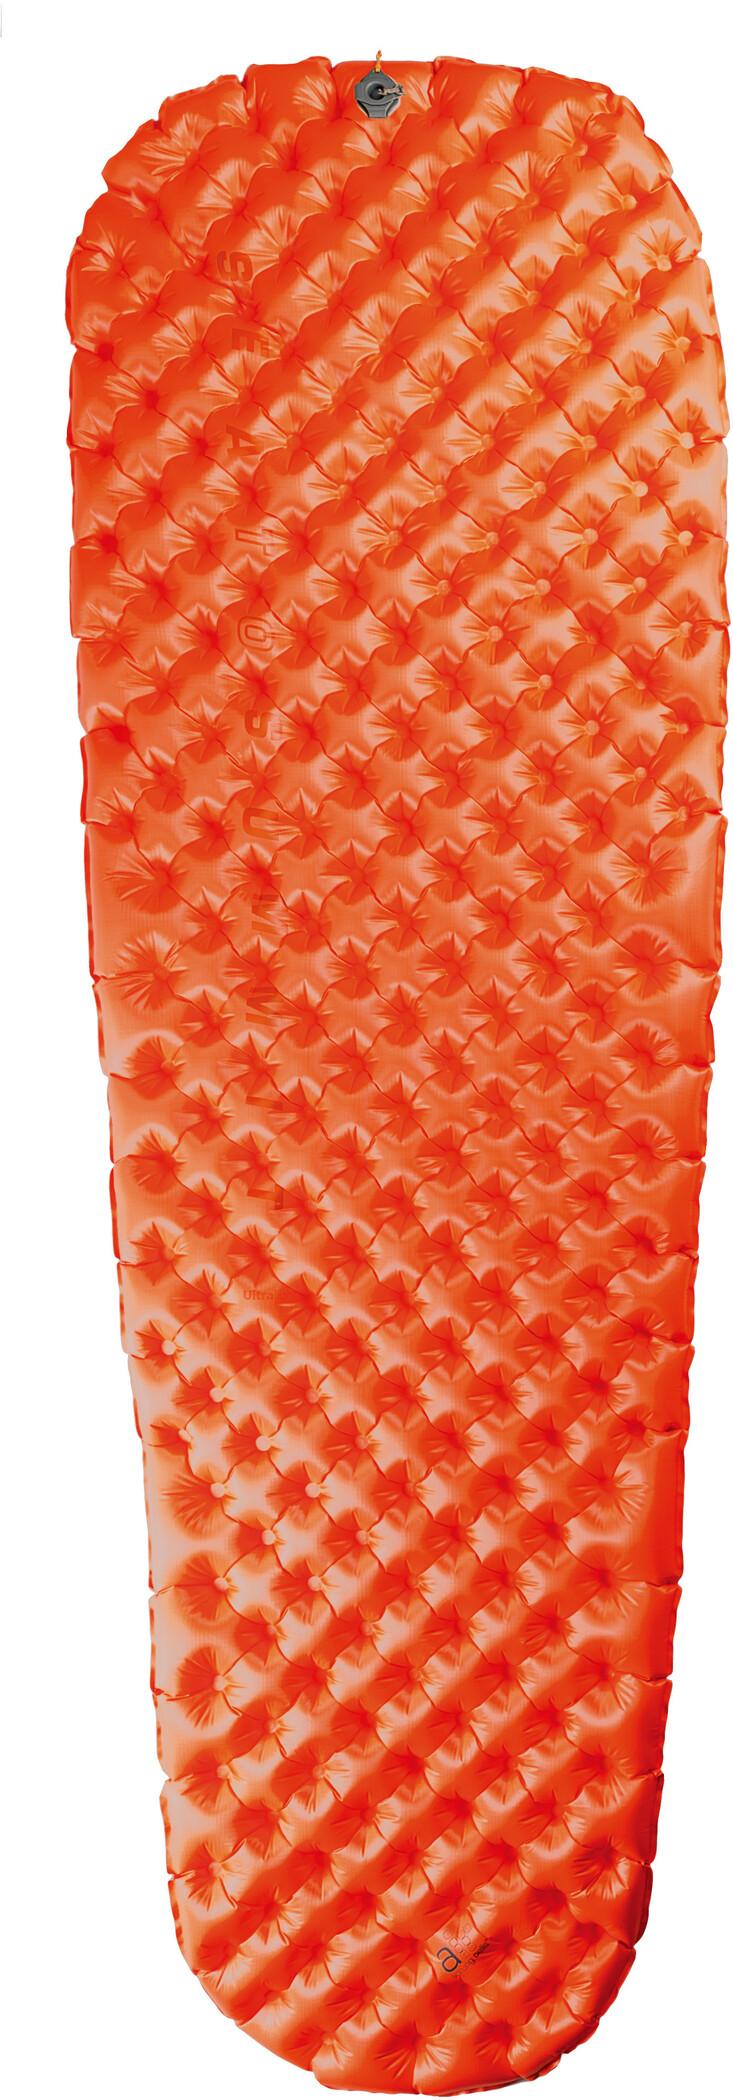 Sea to Summit Ultralight Insulated Mat L, orange (2019) | item_misc